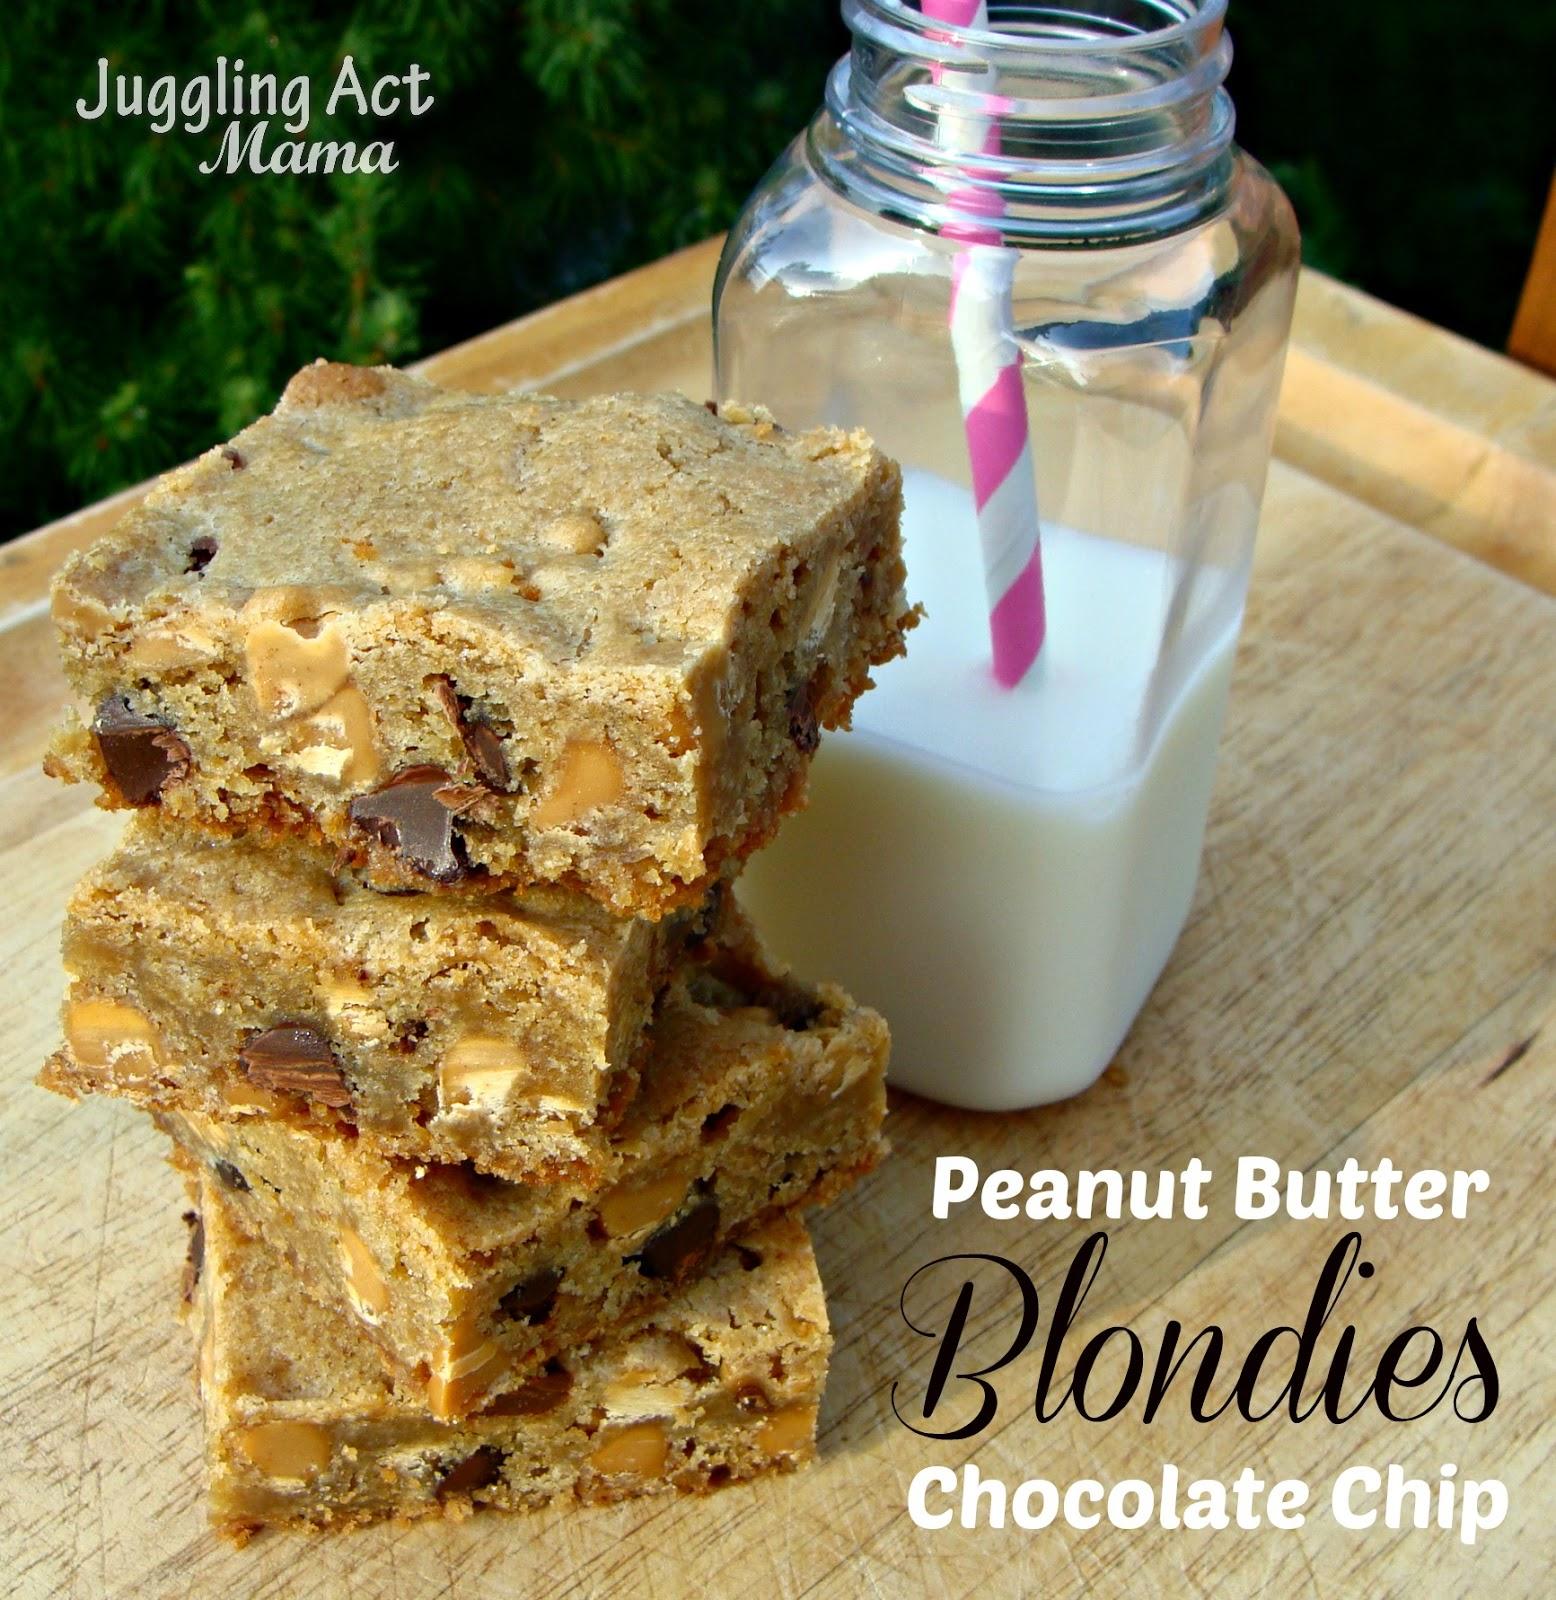 Peanut Butter & Chocolate Chip Blondies {#PasstheCookbook ...